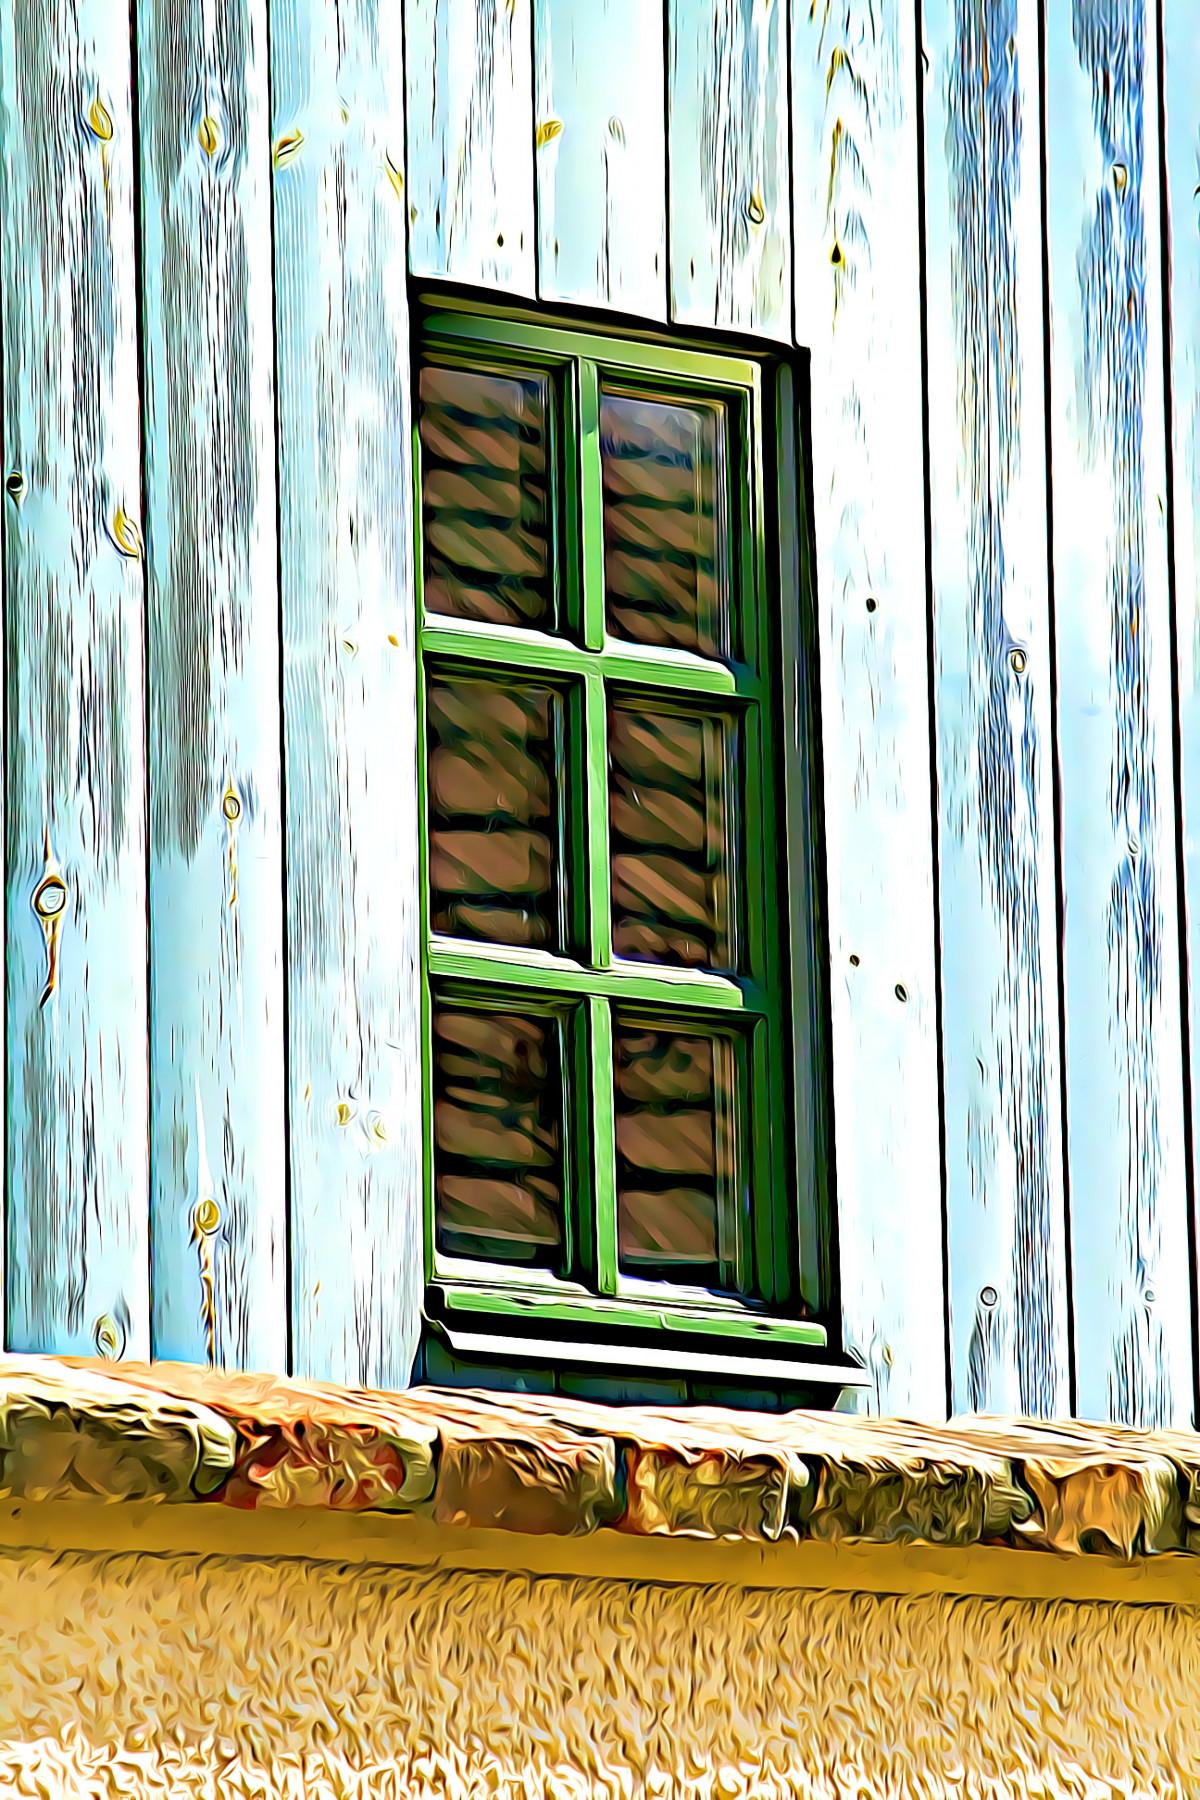 Gambar : kayu, rumah, jendela, kaca, dinding, warna ...